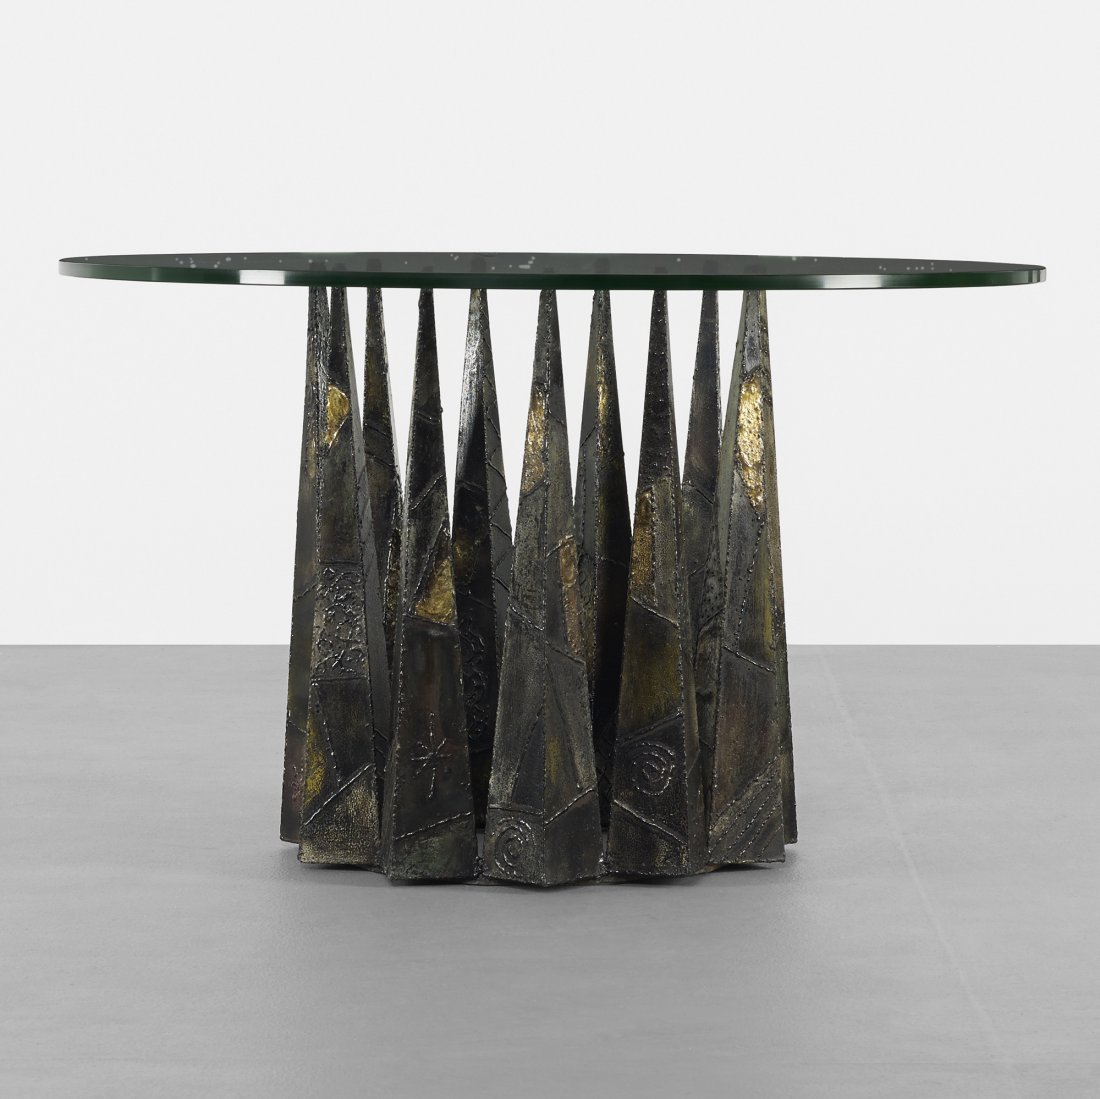 Paul Evans dining table, model PE 46